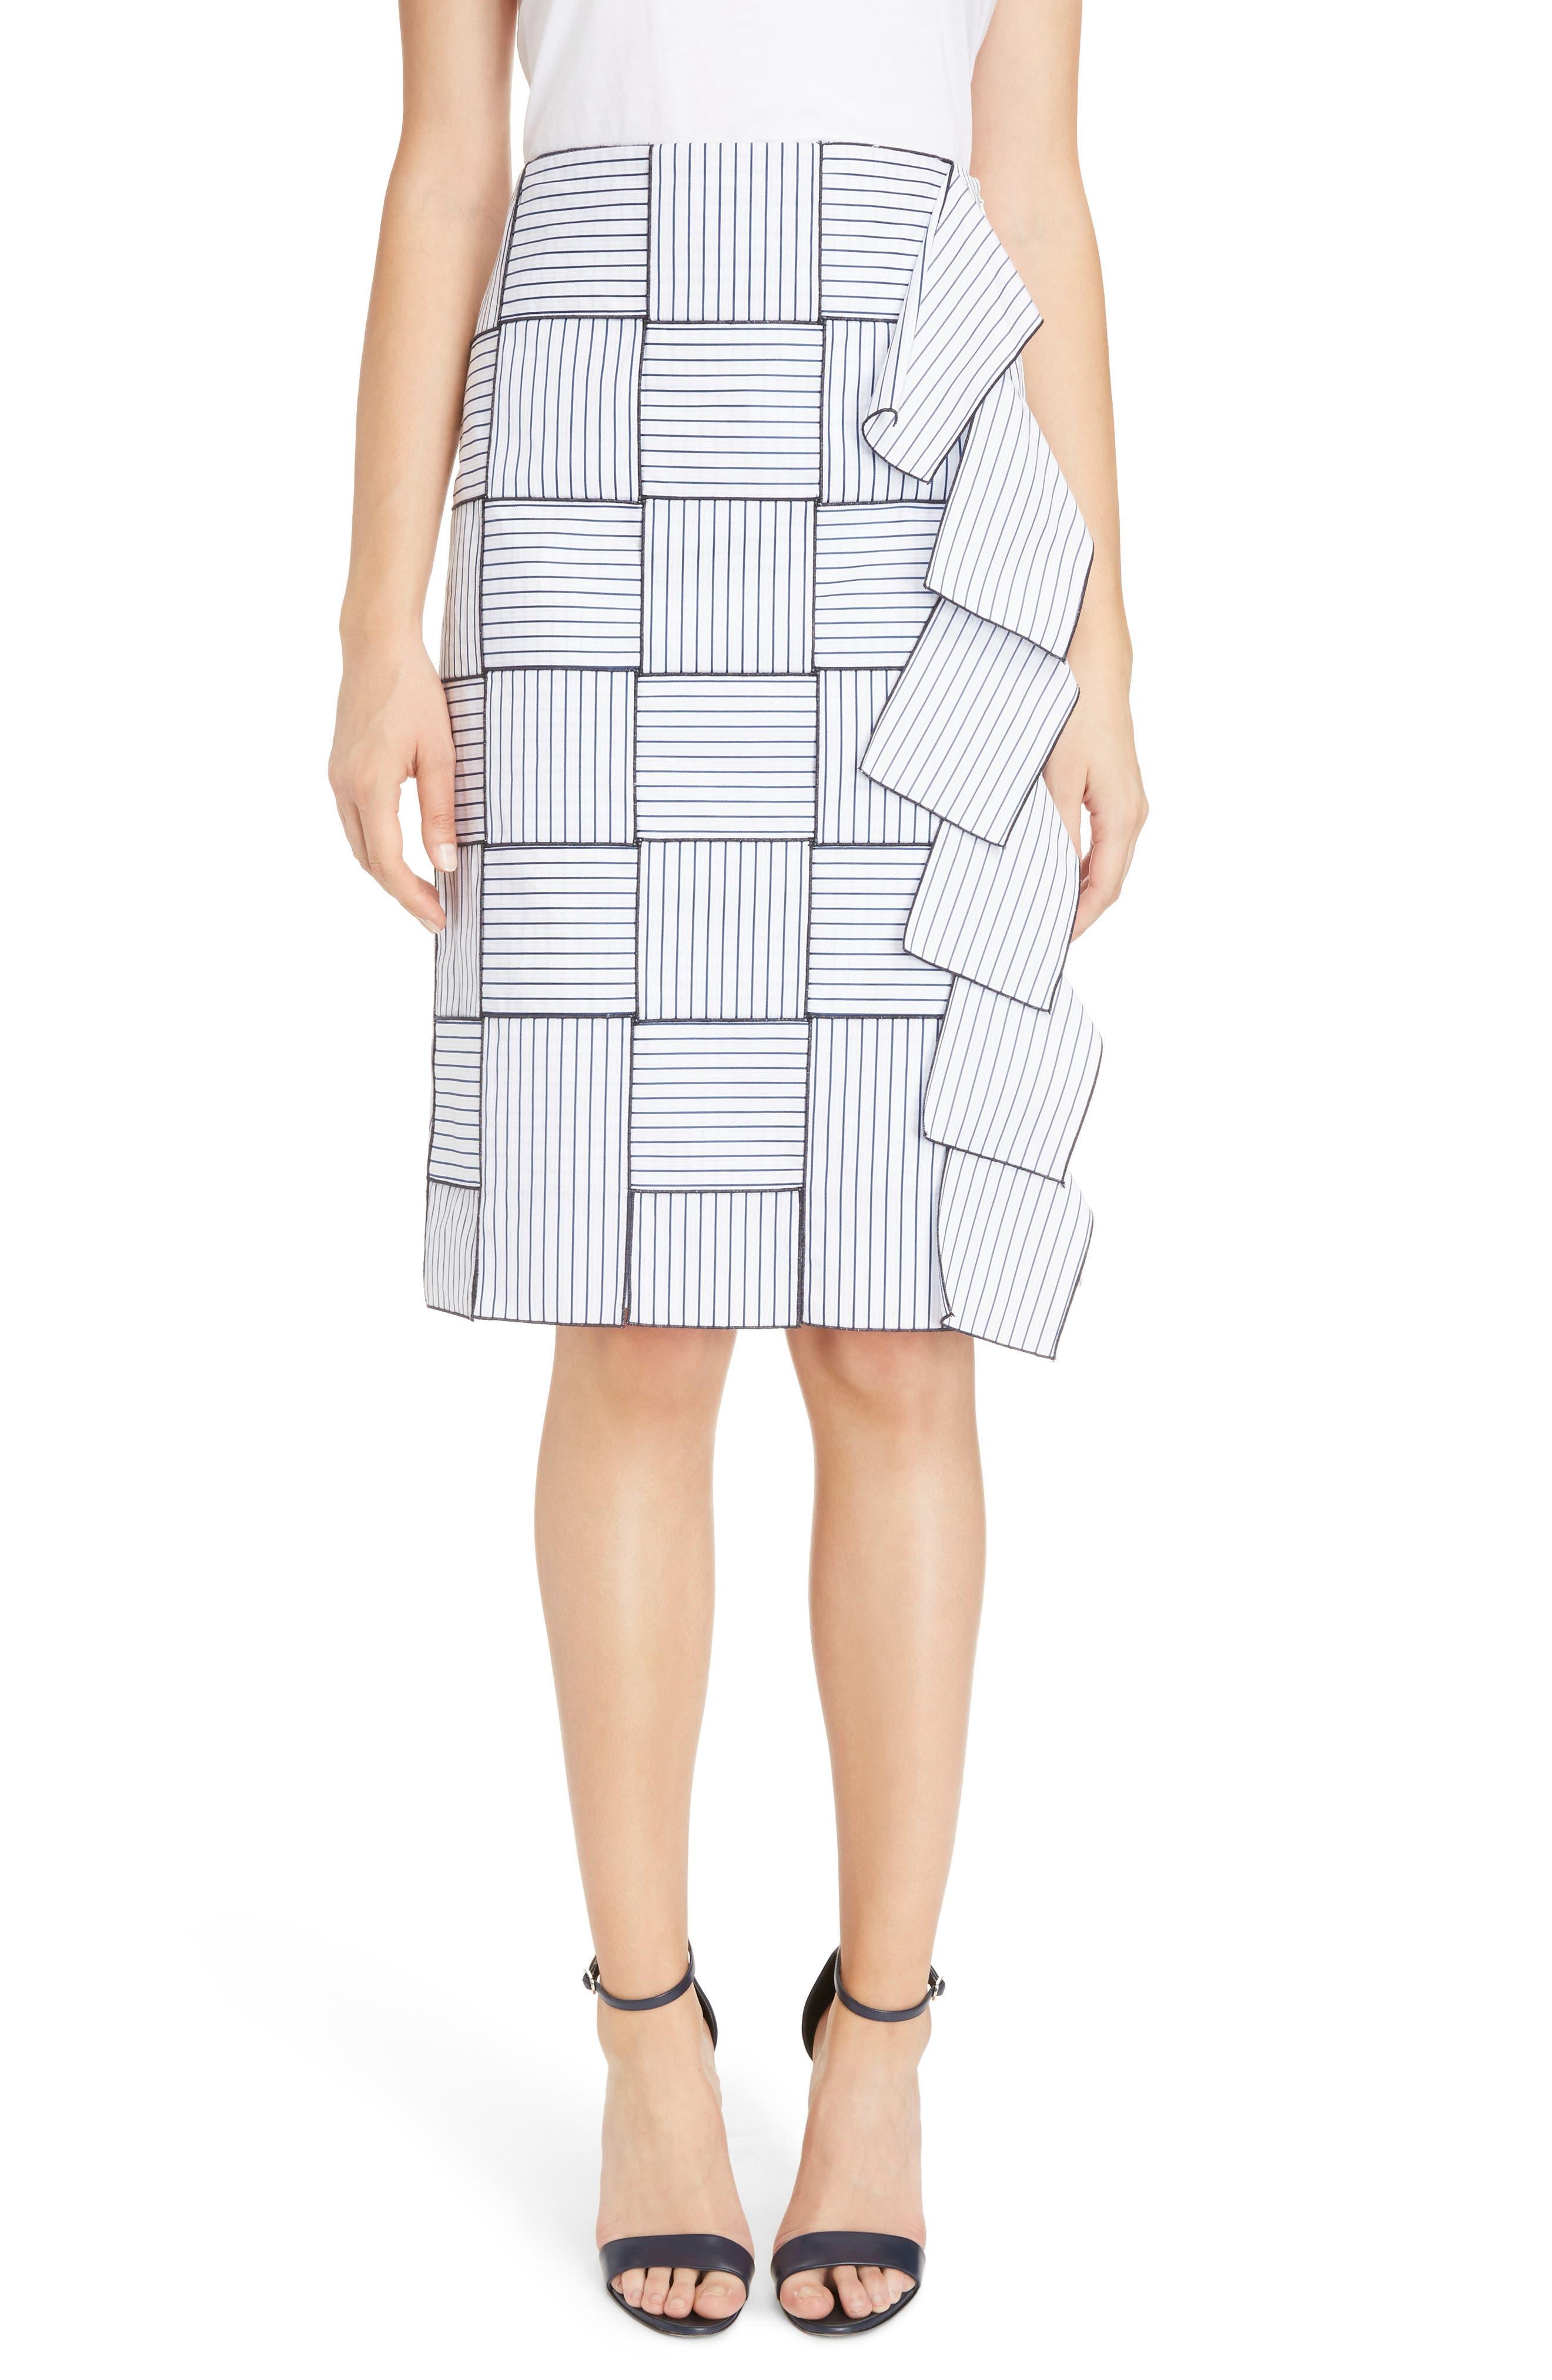 Alternate Image 1 Selected - Victoria, Victoria Beckham Basket-Weave Pencil Skirt